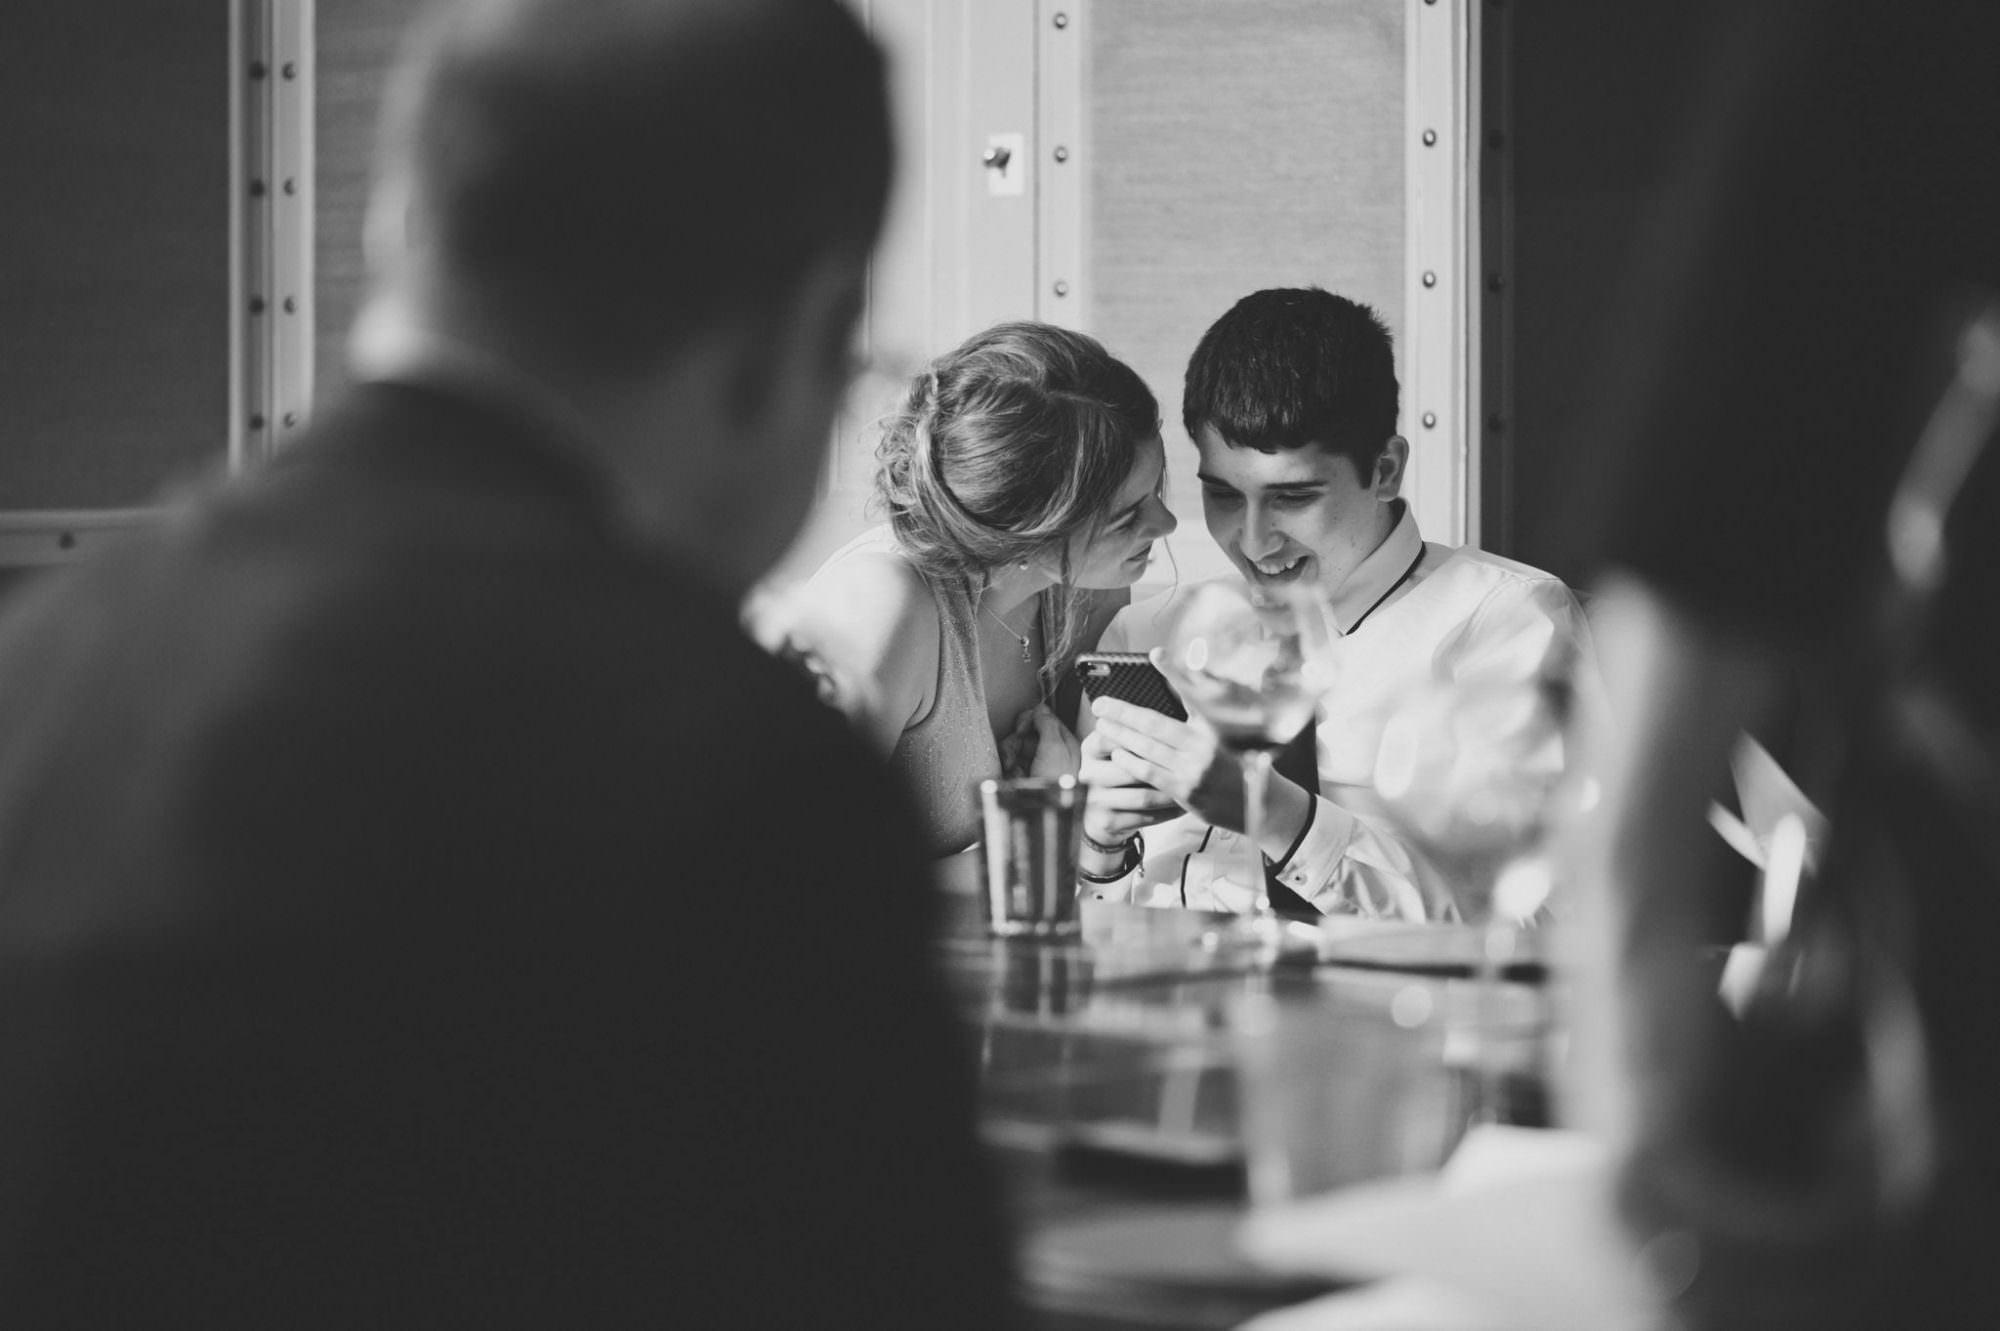 Event by Dorset Hampshire Wedding Photographer